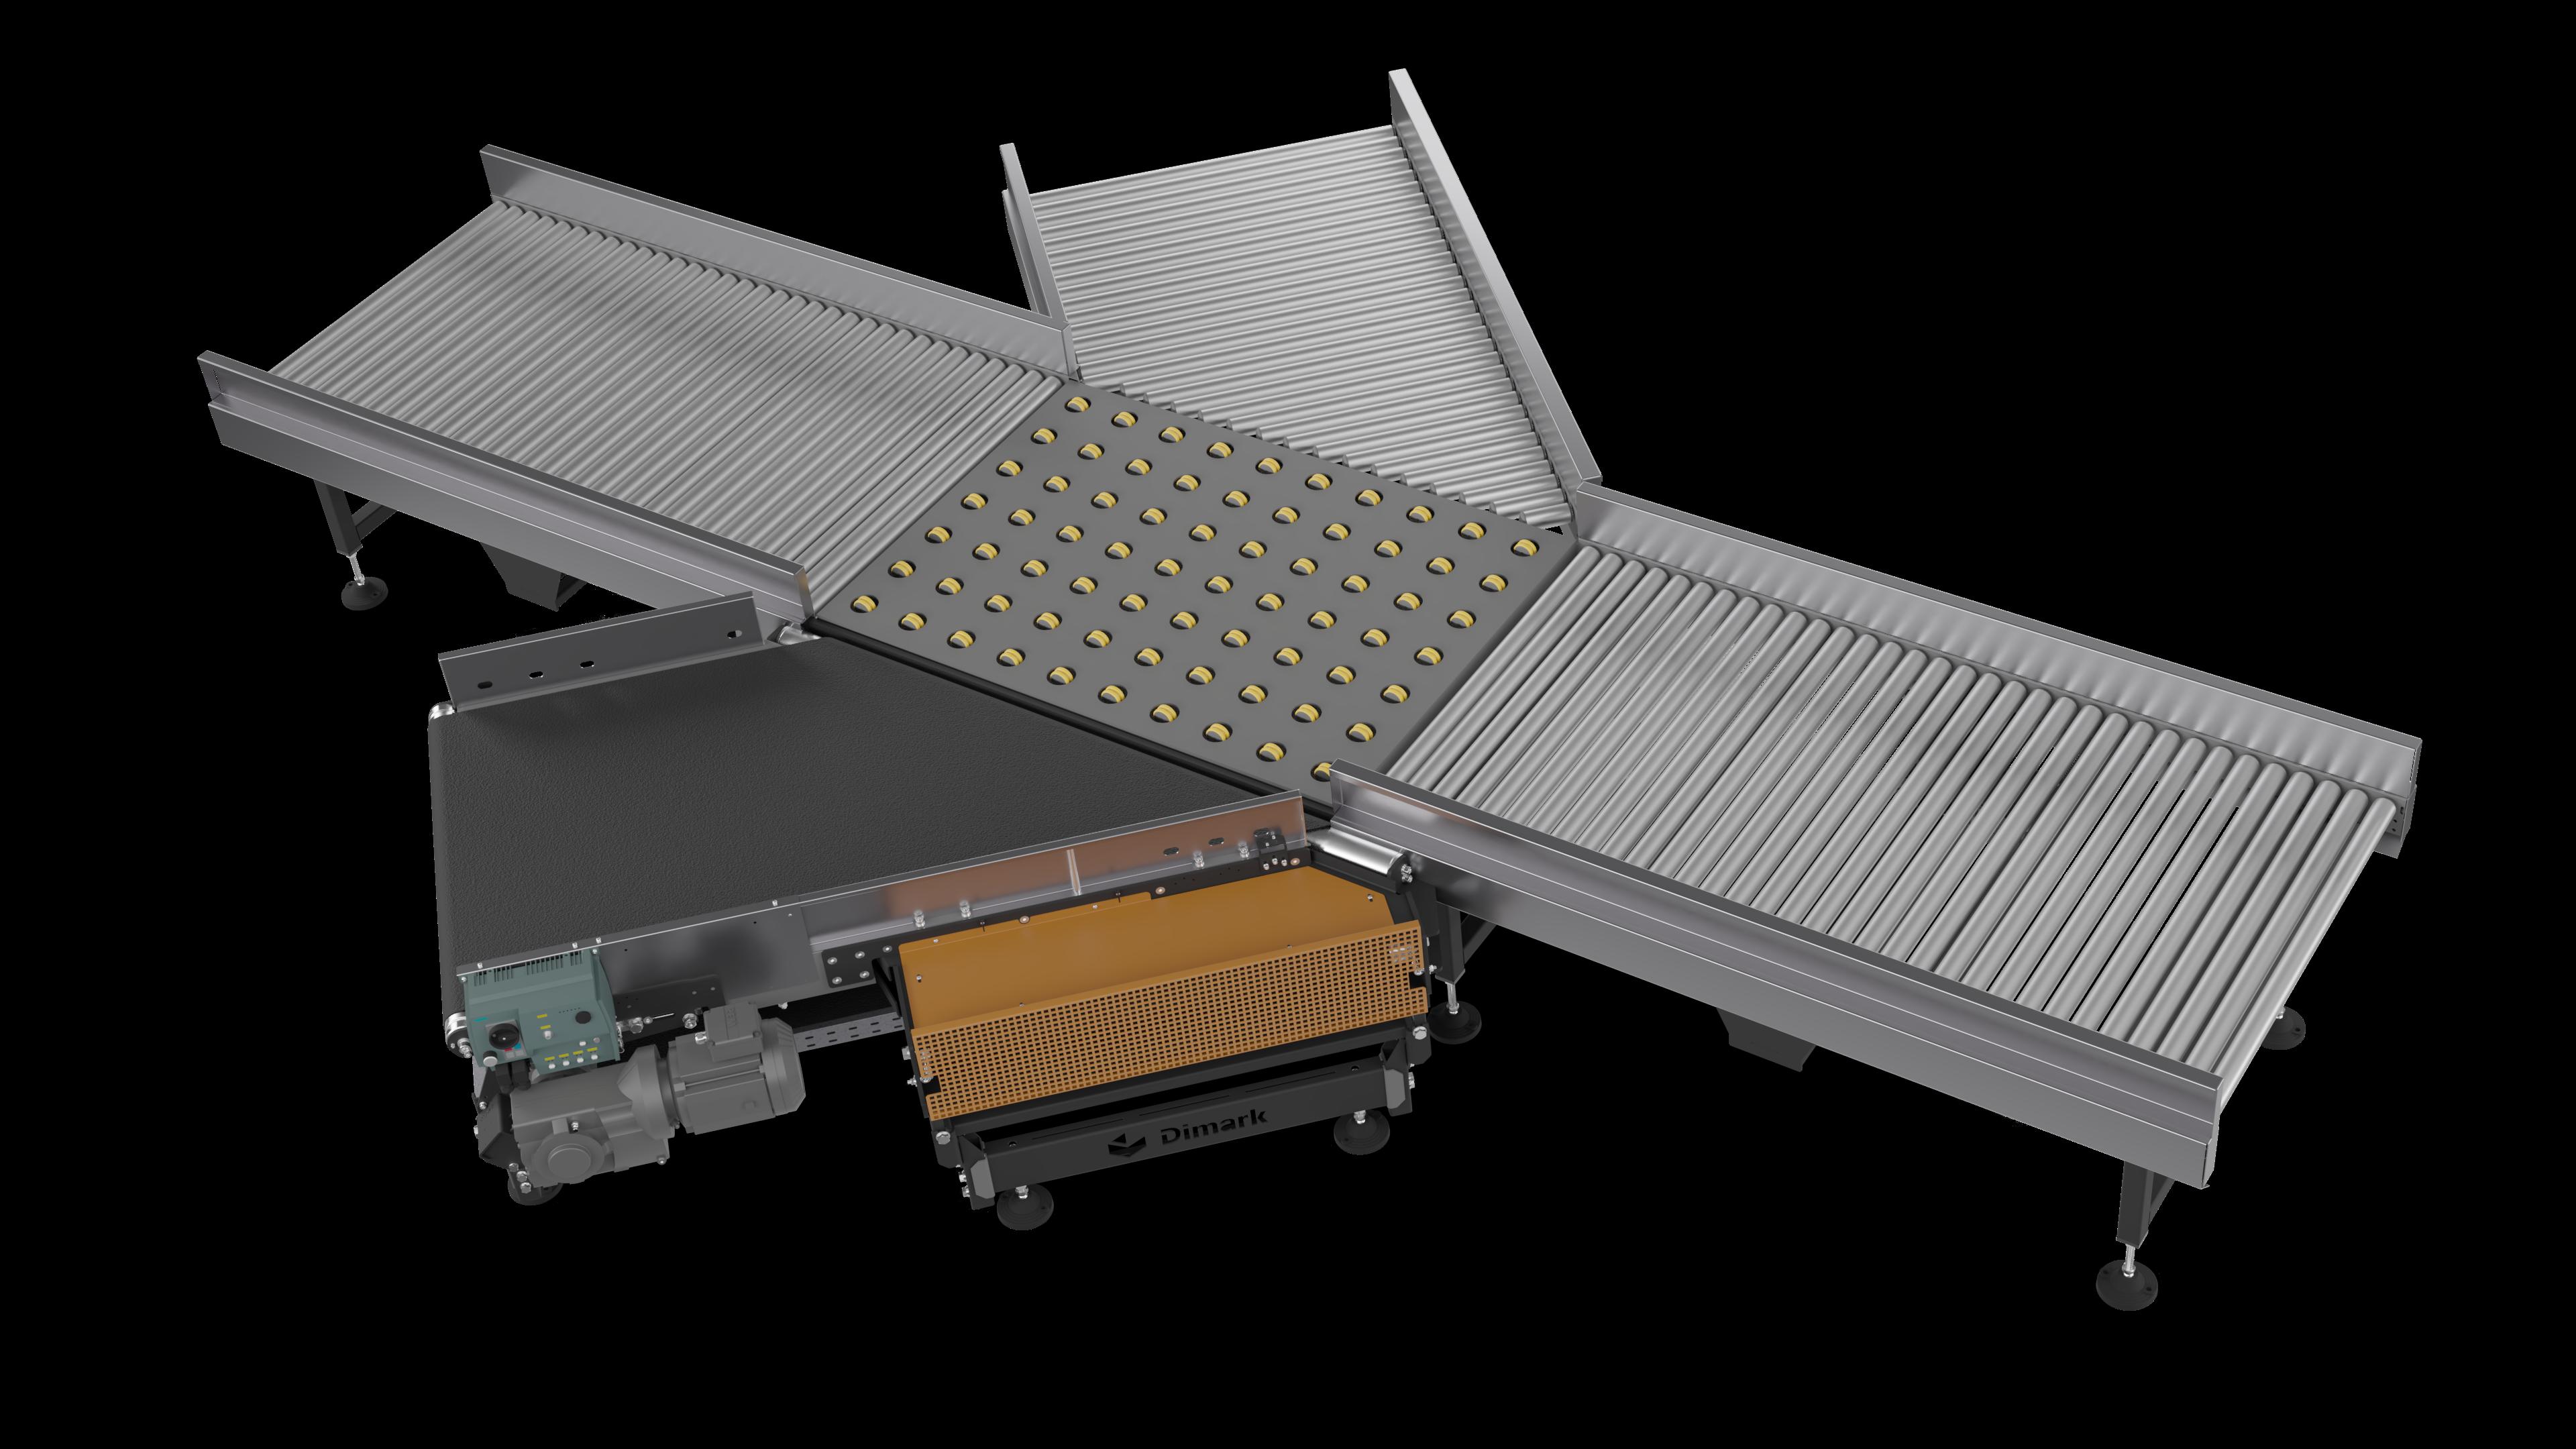 Horizontal distribution conveyor 003